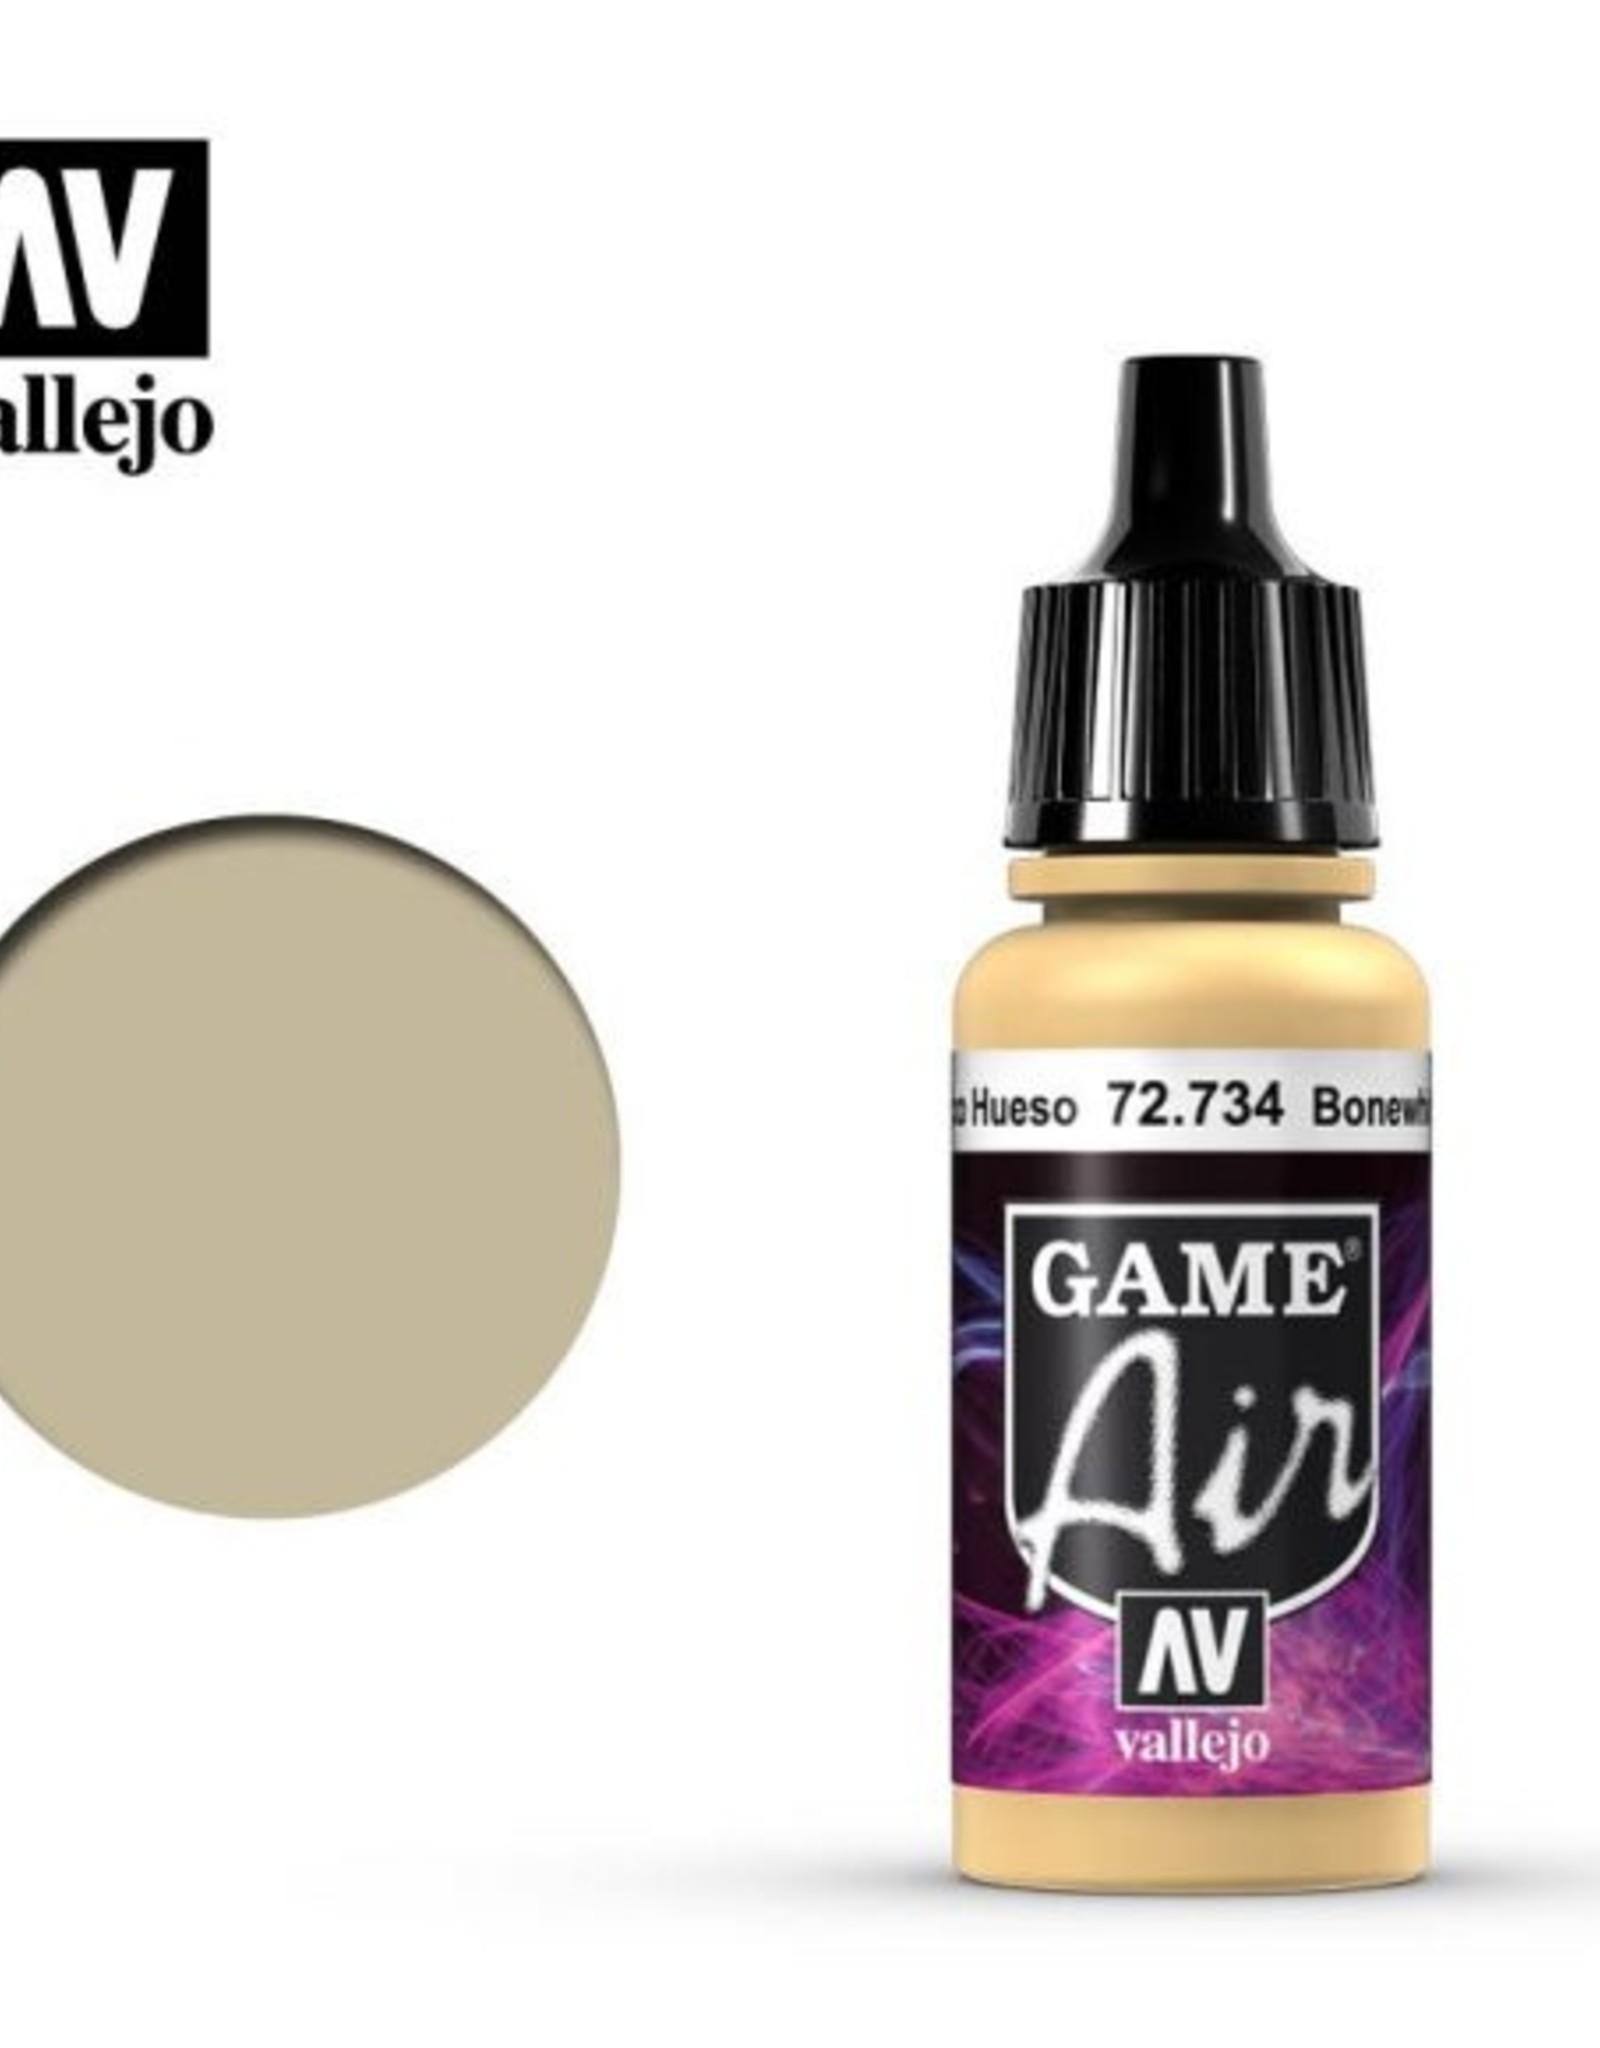 Vallejo Game Air:  72.734 Bone White